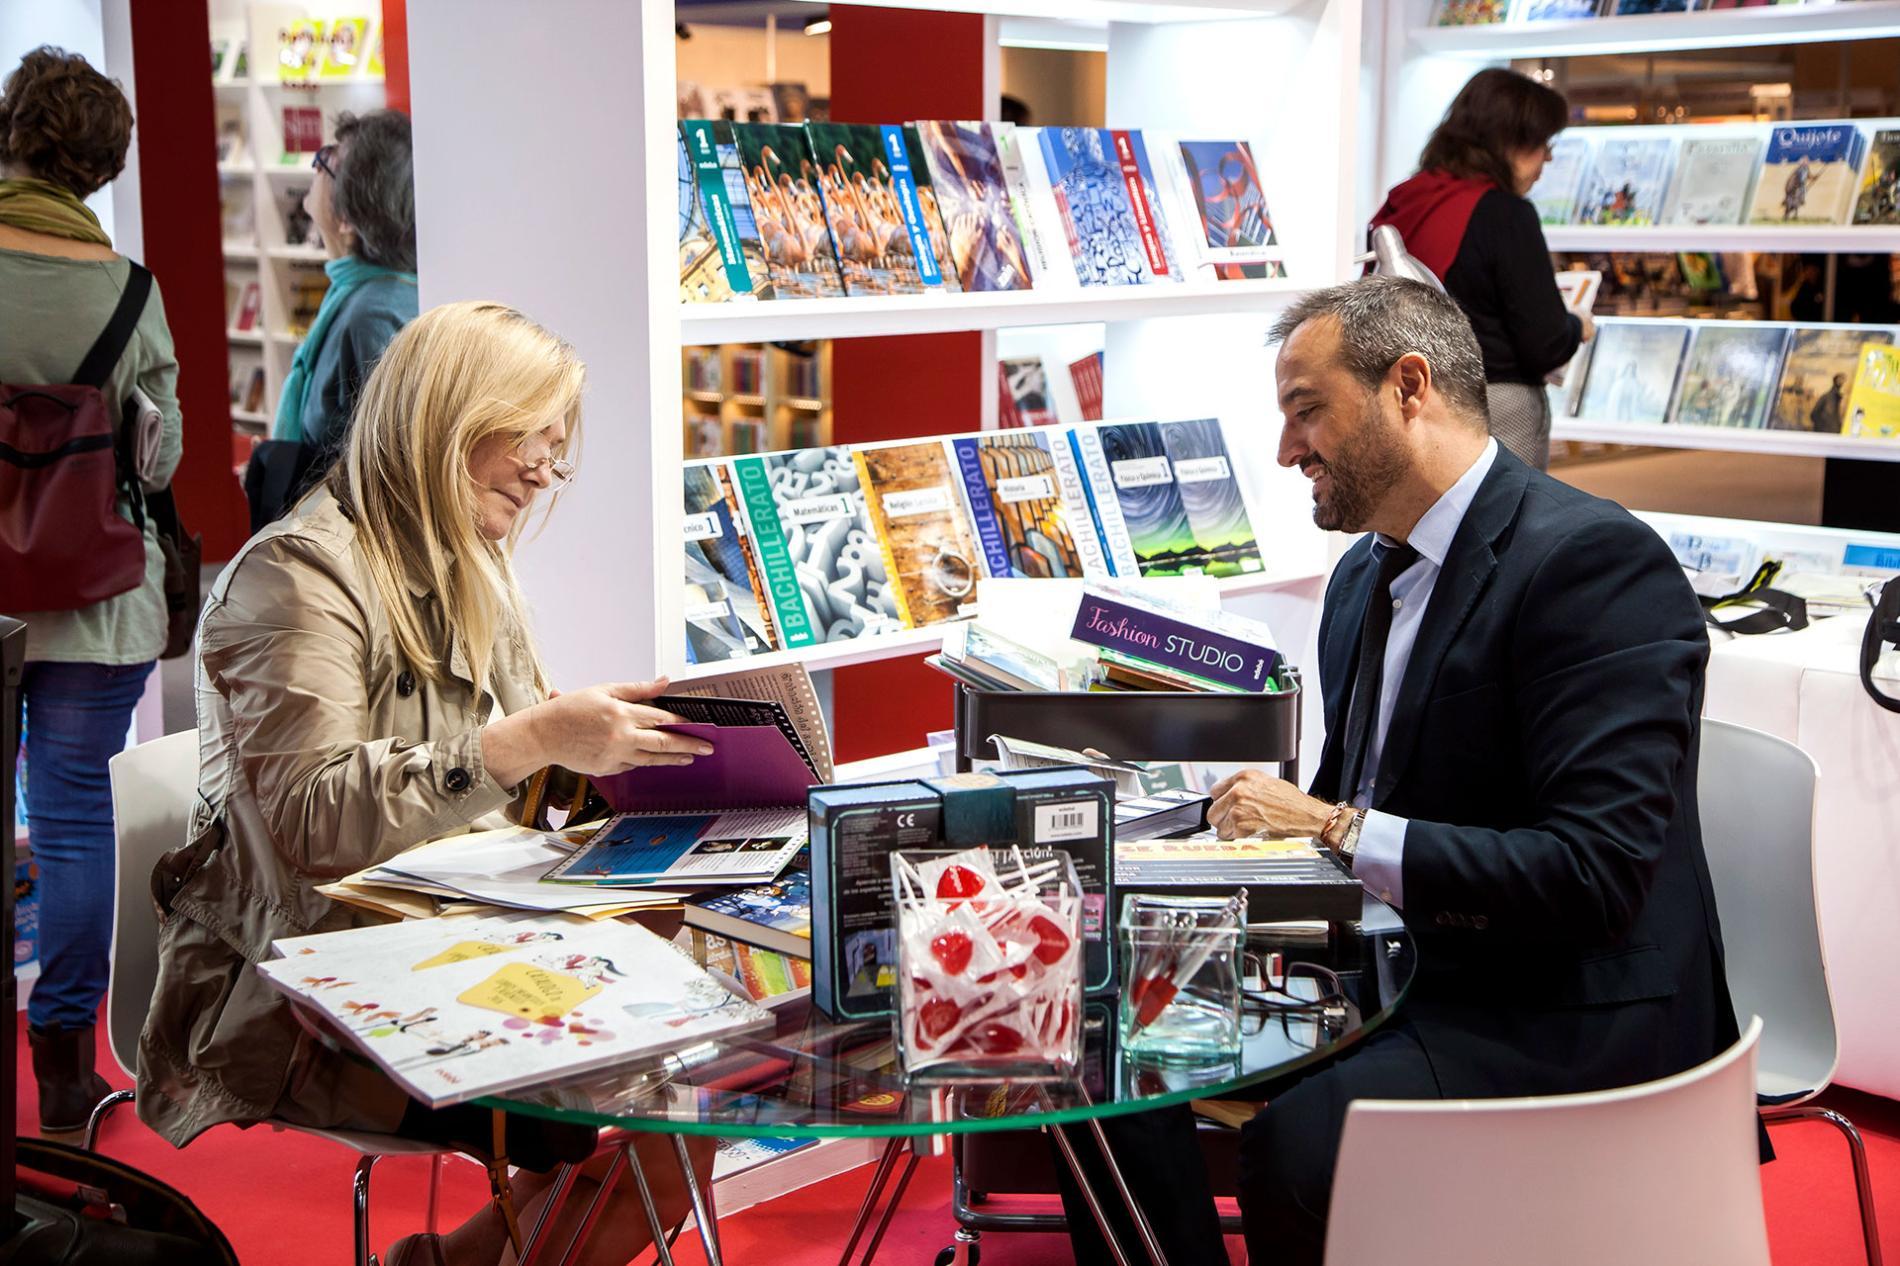 Liber 2017 muestra optimismo en el sector del libro